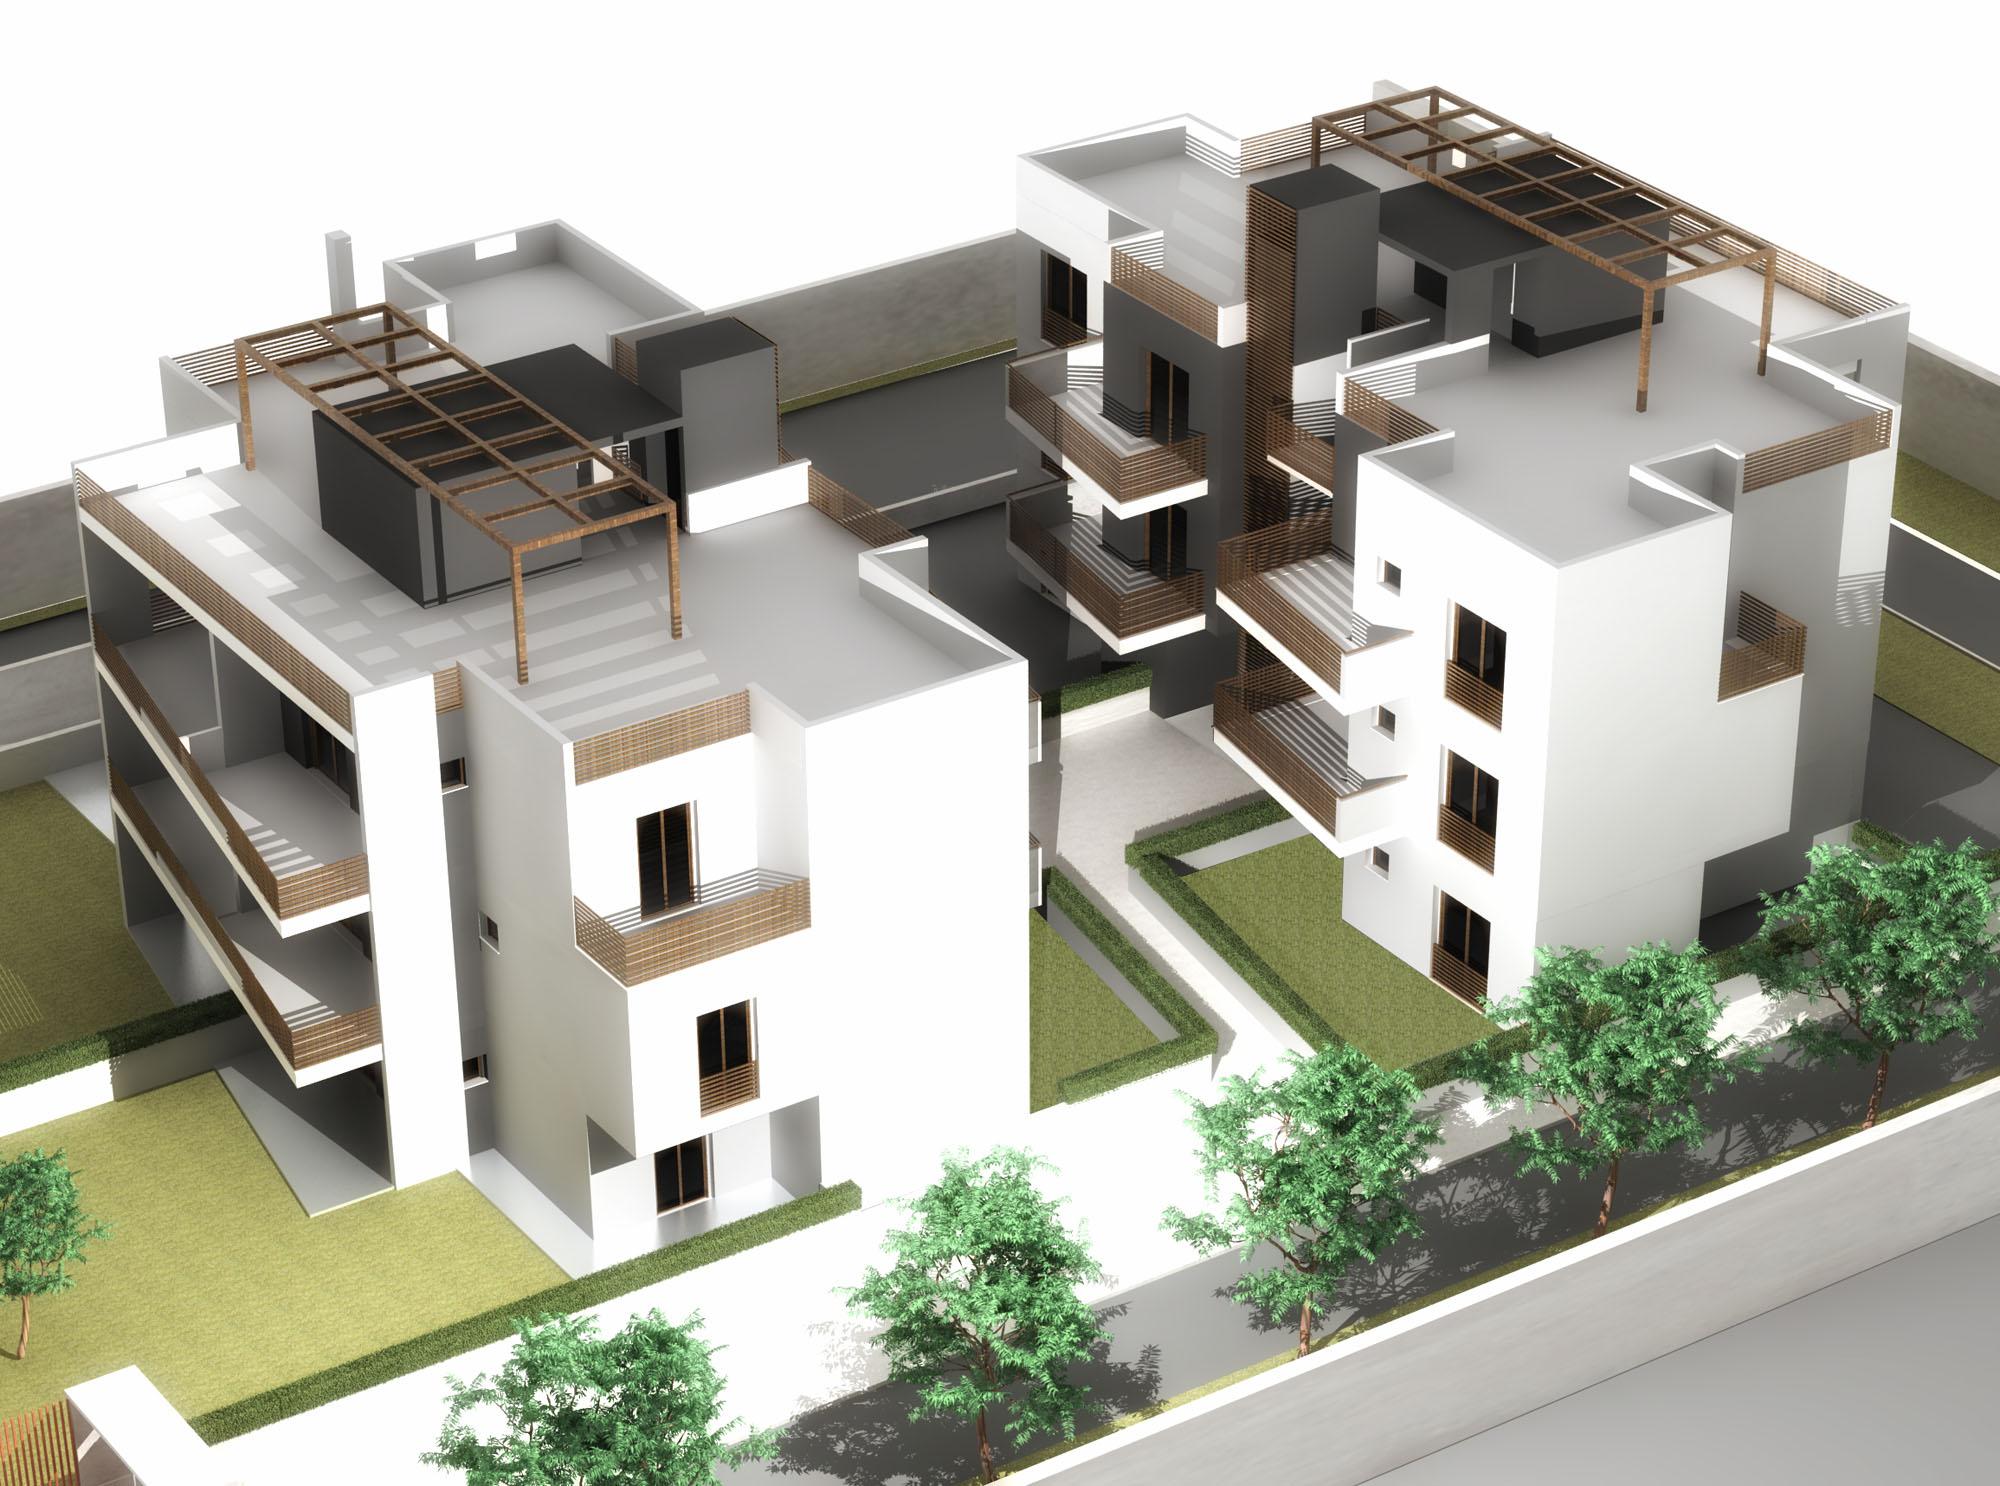 Giugno 2013 franco bernardini architetto for Palazzine moderne